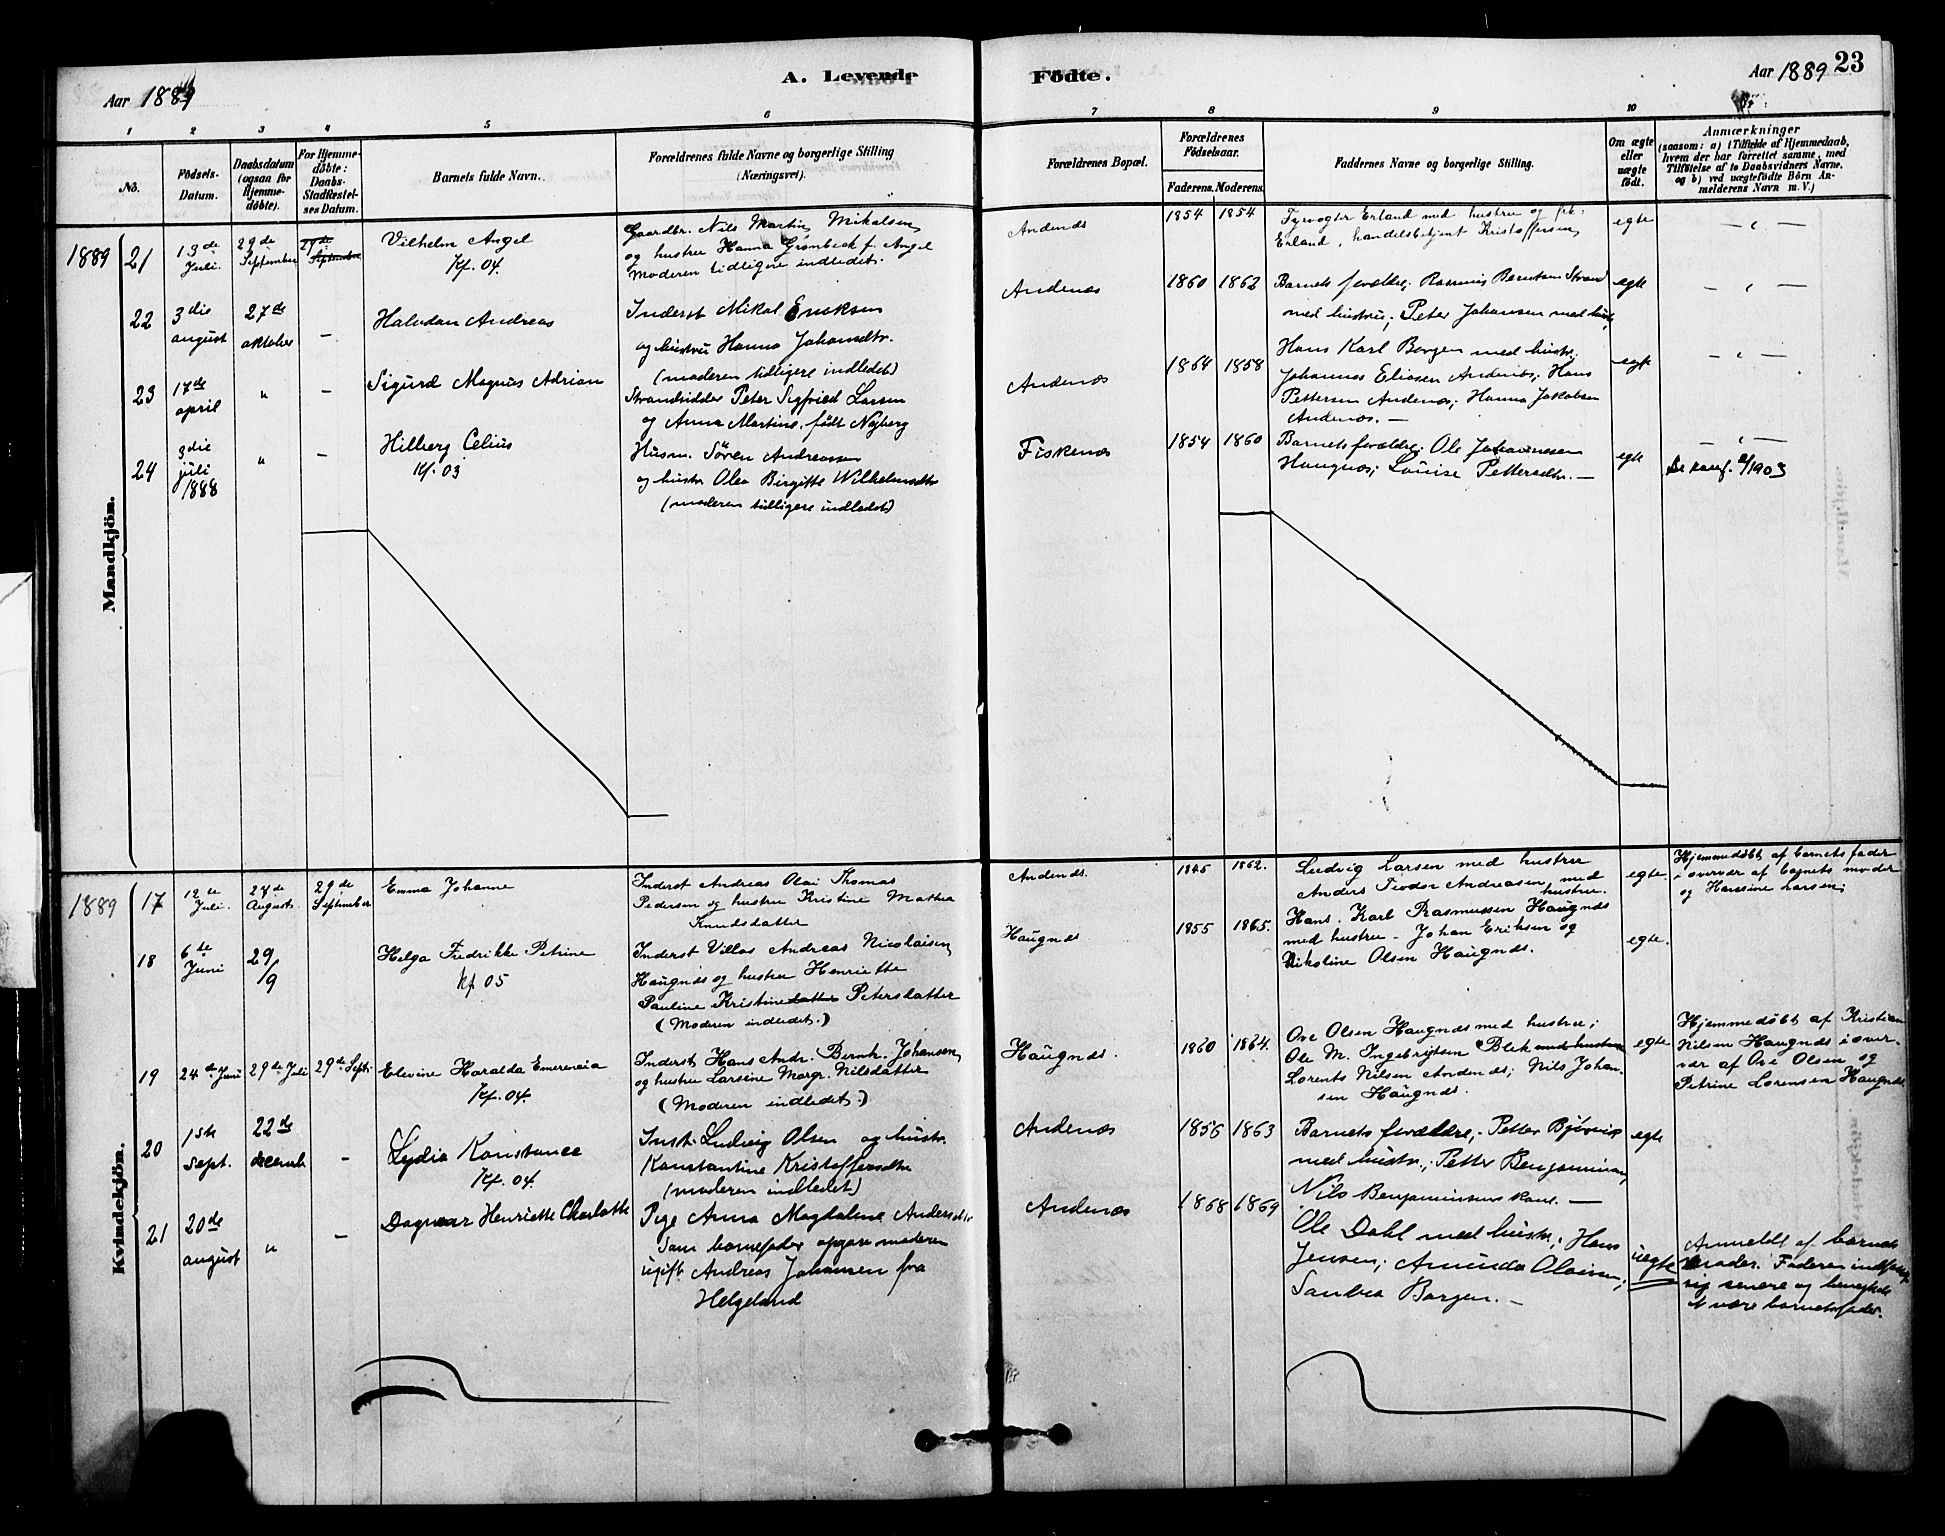 SAT, Ministerialprotokoller, klokkerbøker og fødselsregistre - Nordland, 899/L1436: Ministerialbok nr. 899A04, 1881-1896, s. 23